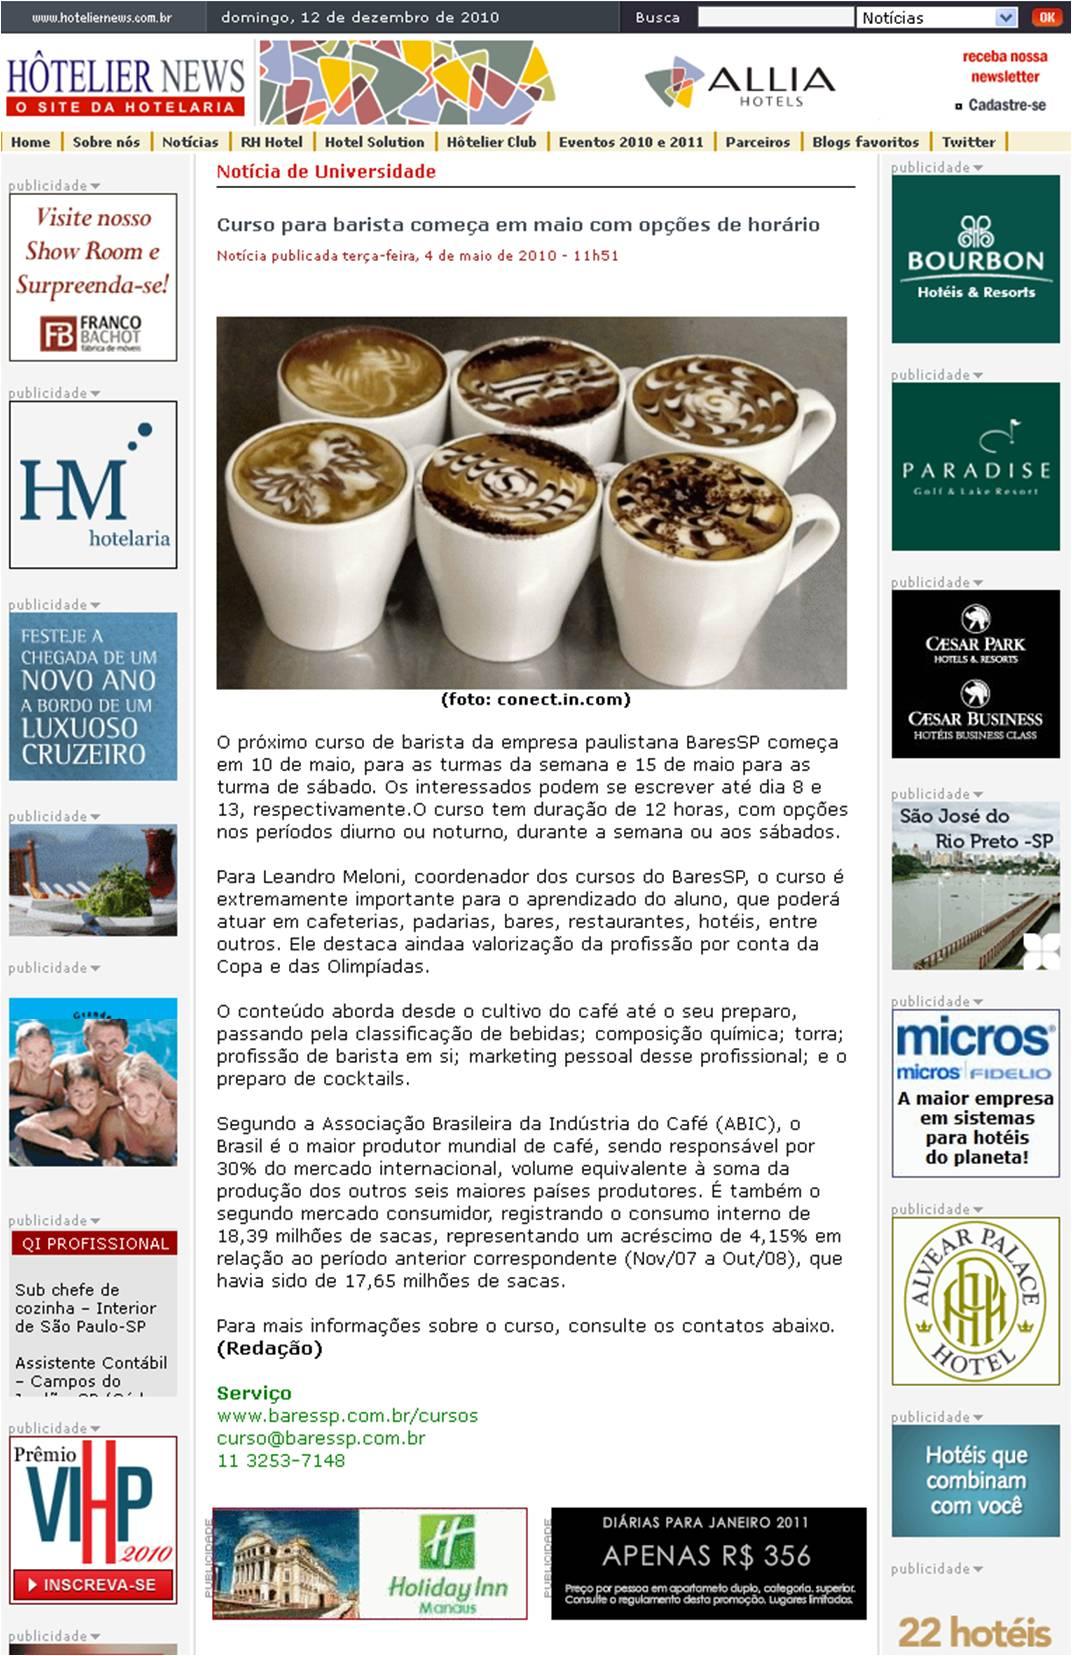 Curso de baristas no Site Hotelier News